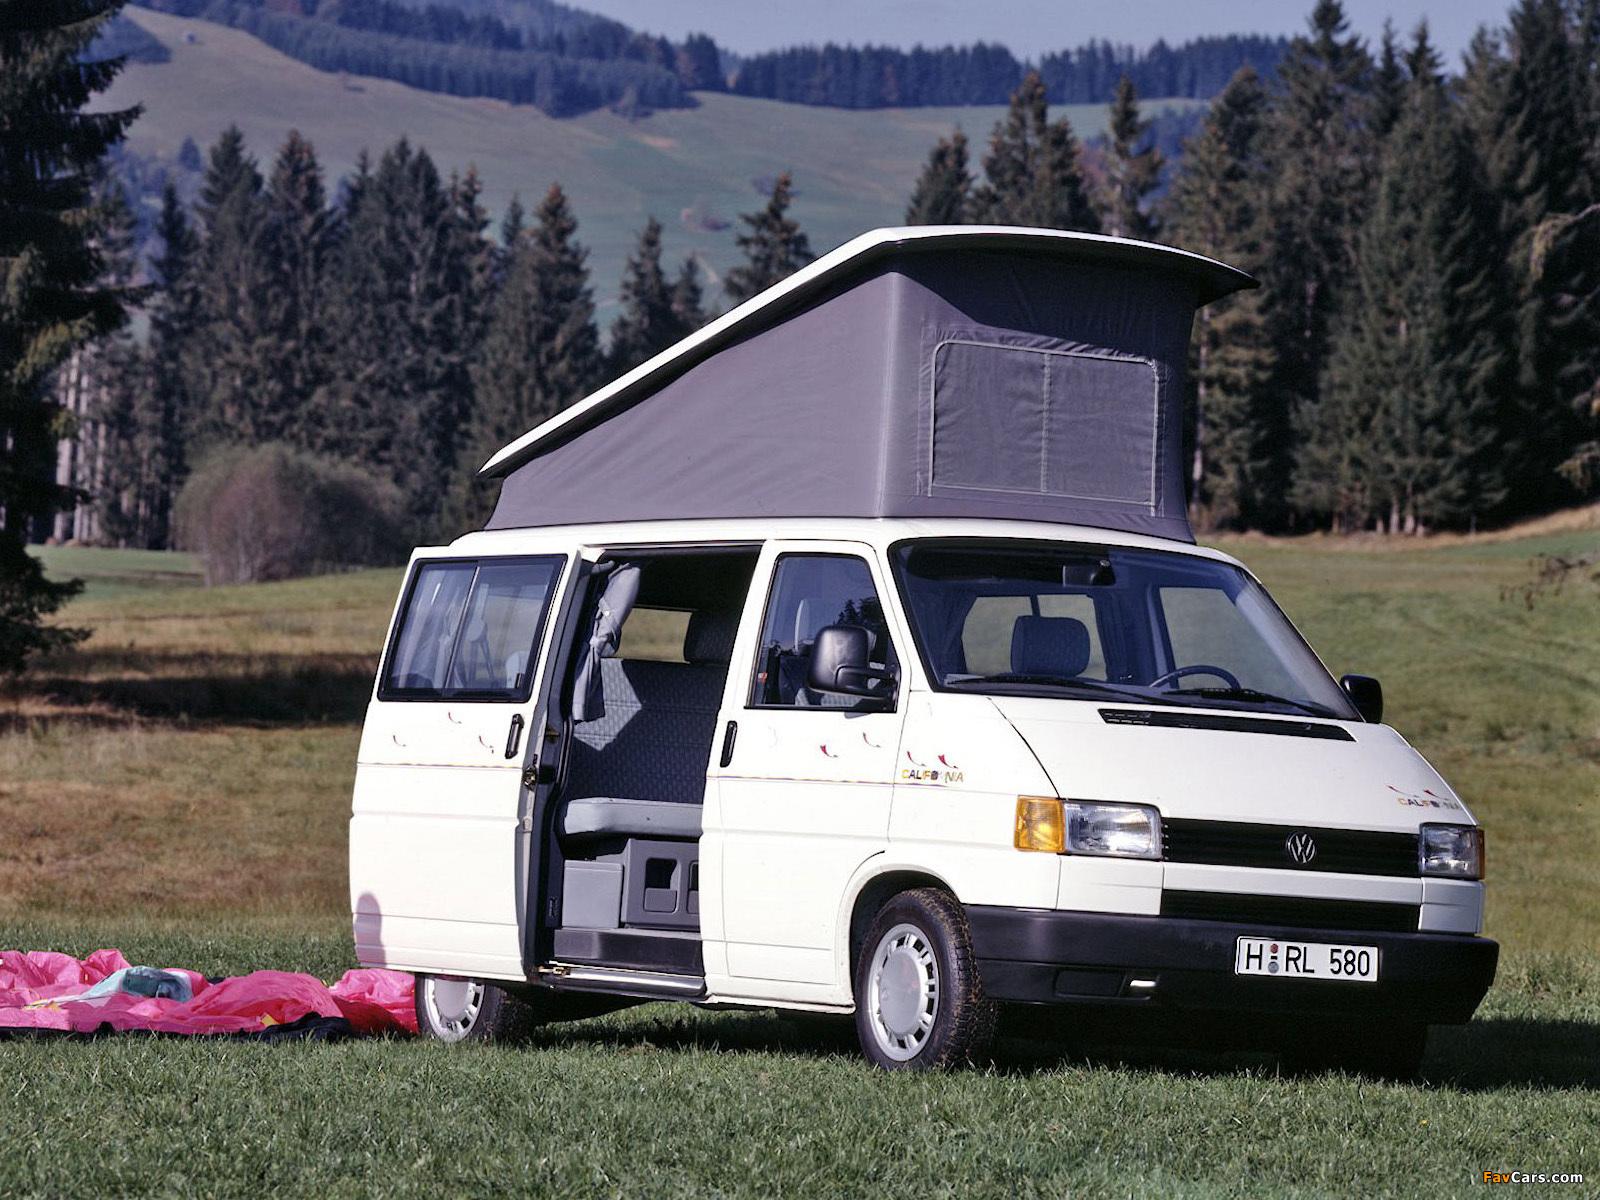 volkswagen t4 california 1991 96 wallpapers 1600x1200. Black Bedroom Furniture Sets. Home Design Ideas